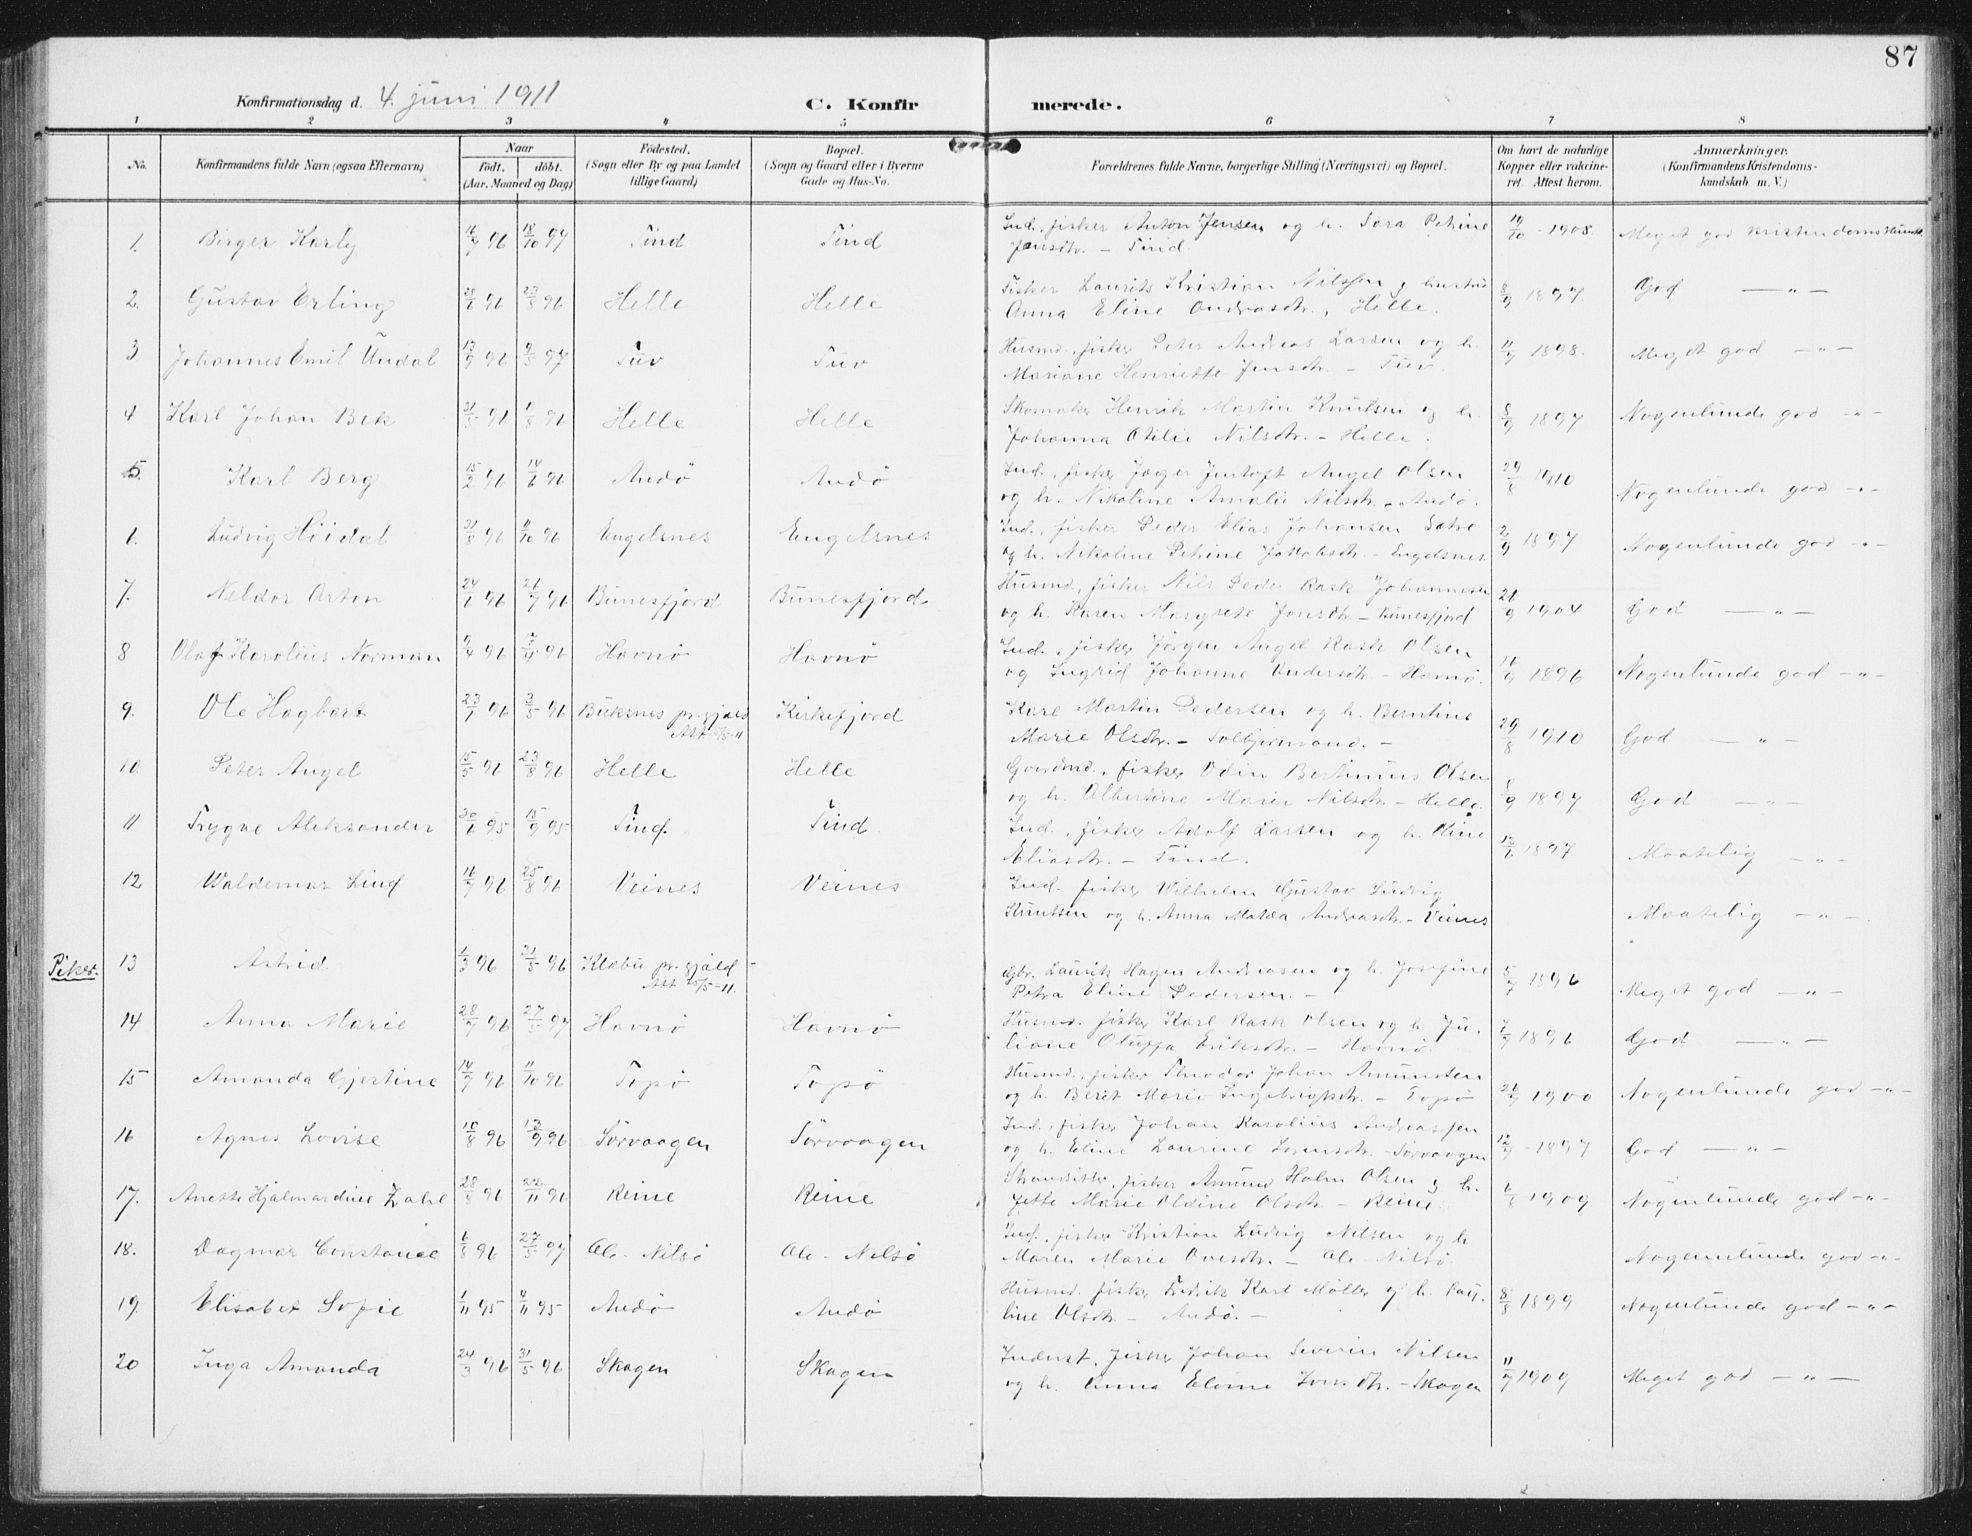 SAT, Ministerialprotokoller, klokkerbøker og fødselsregistre - Nordland, 886/L1221: Ministerialbok nr. 886A03, 1903-1913, s. 87